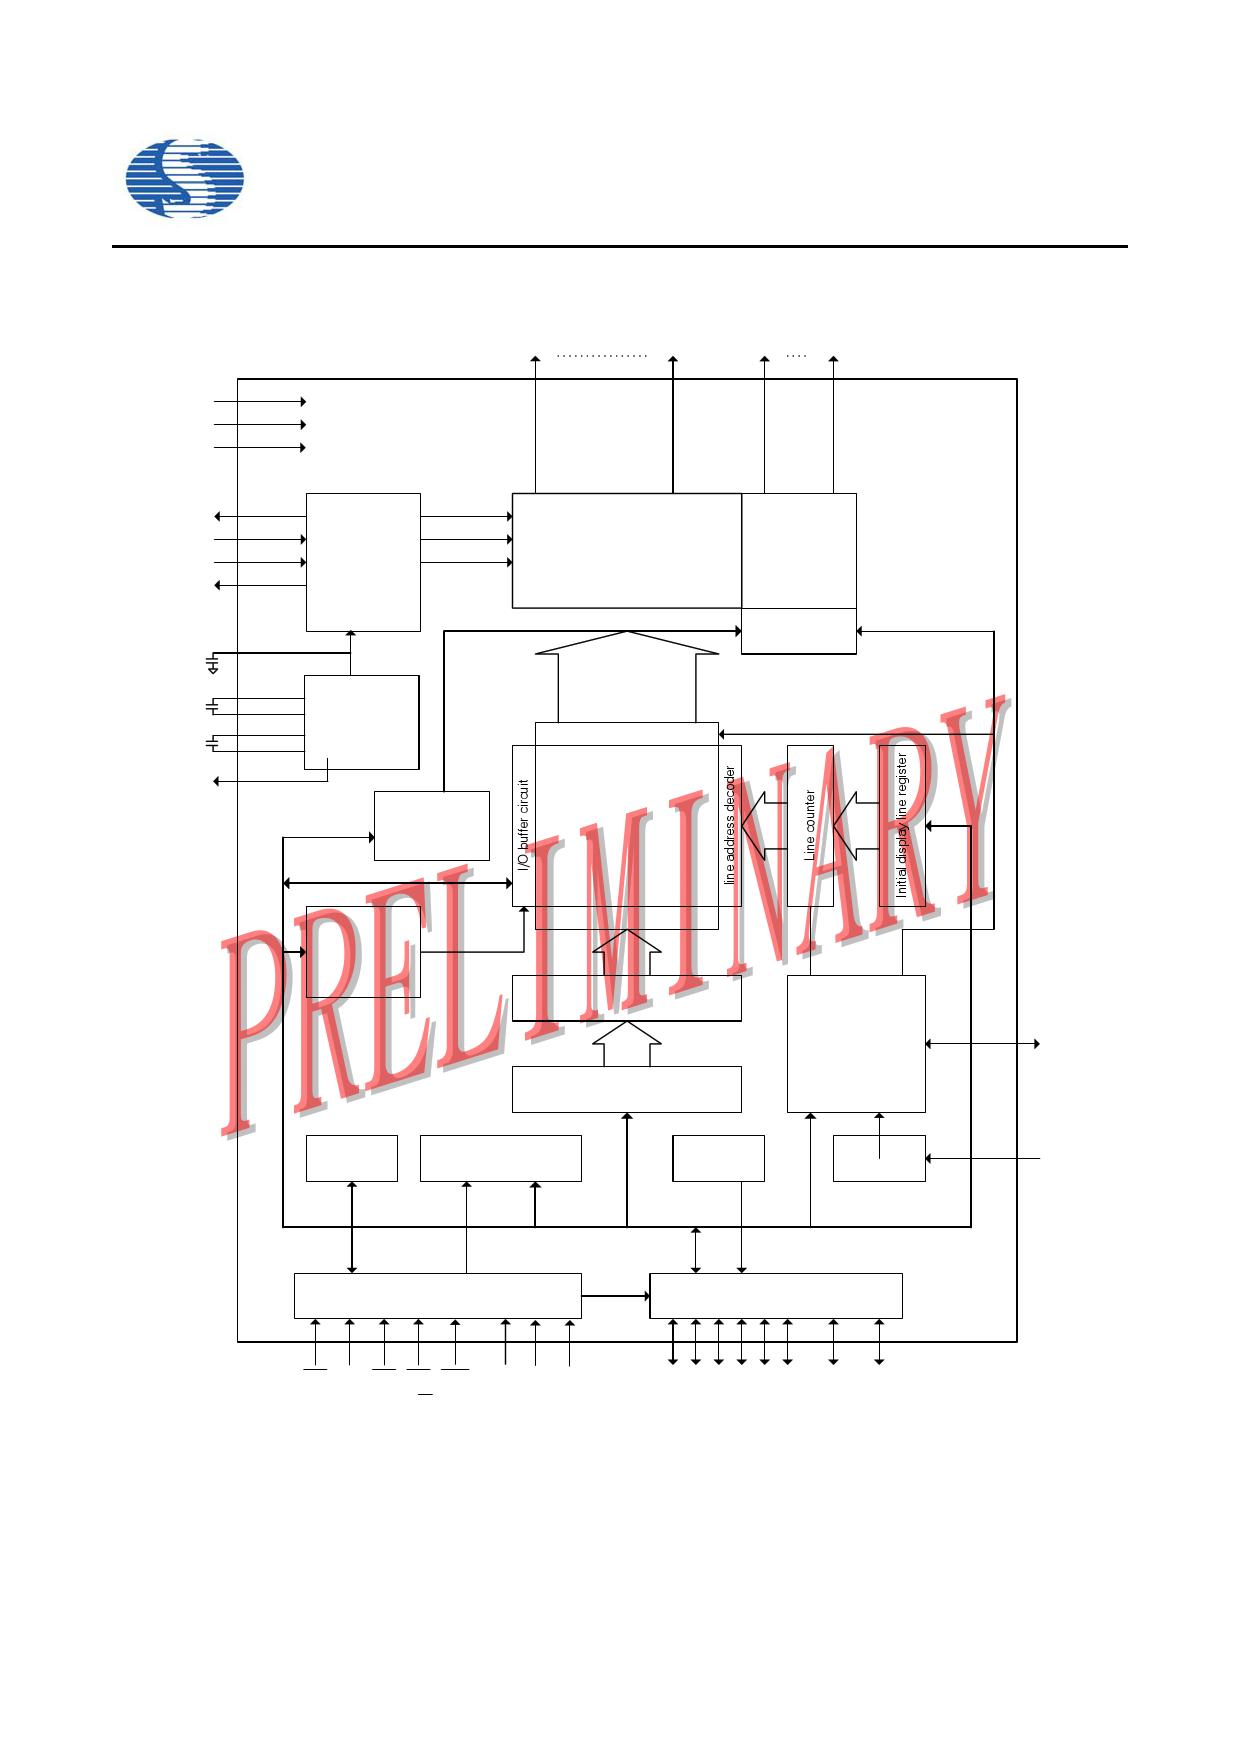 SH1106 pdf schematic